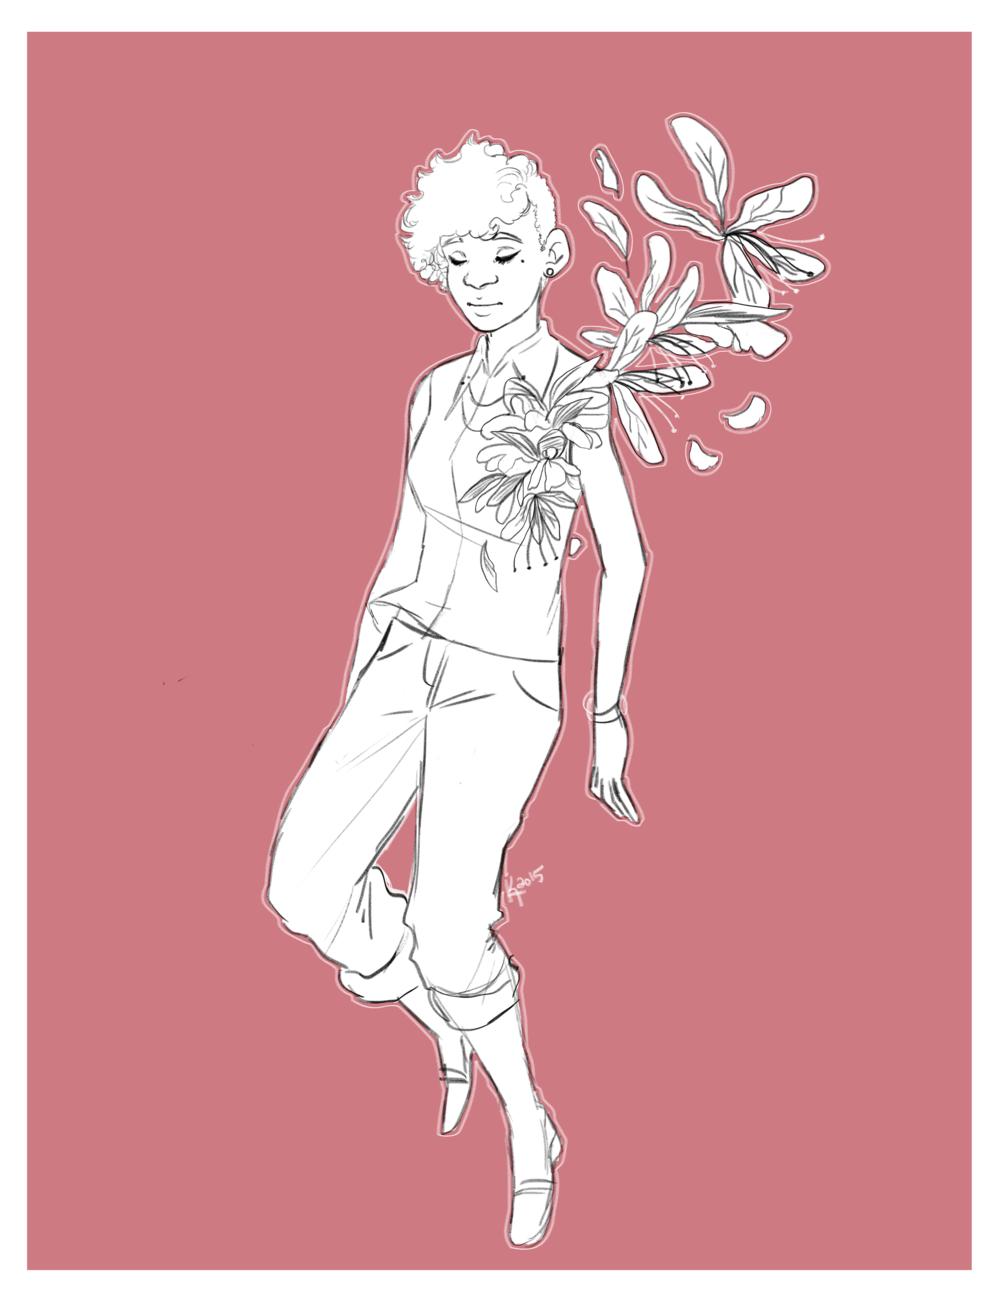 floral_cinaed.png